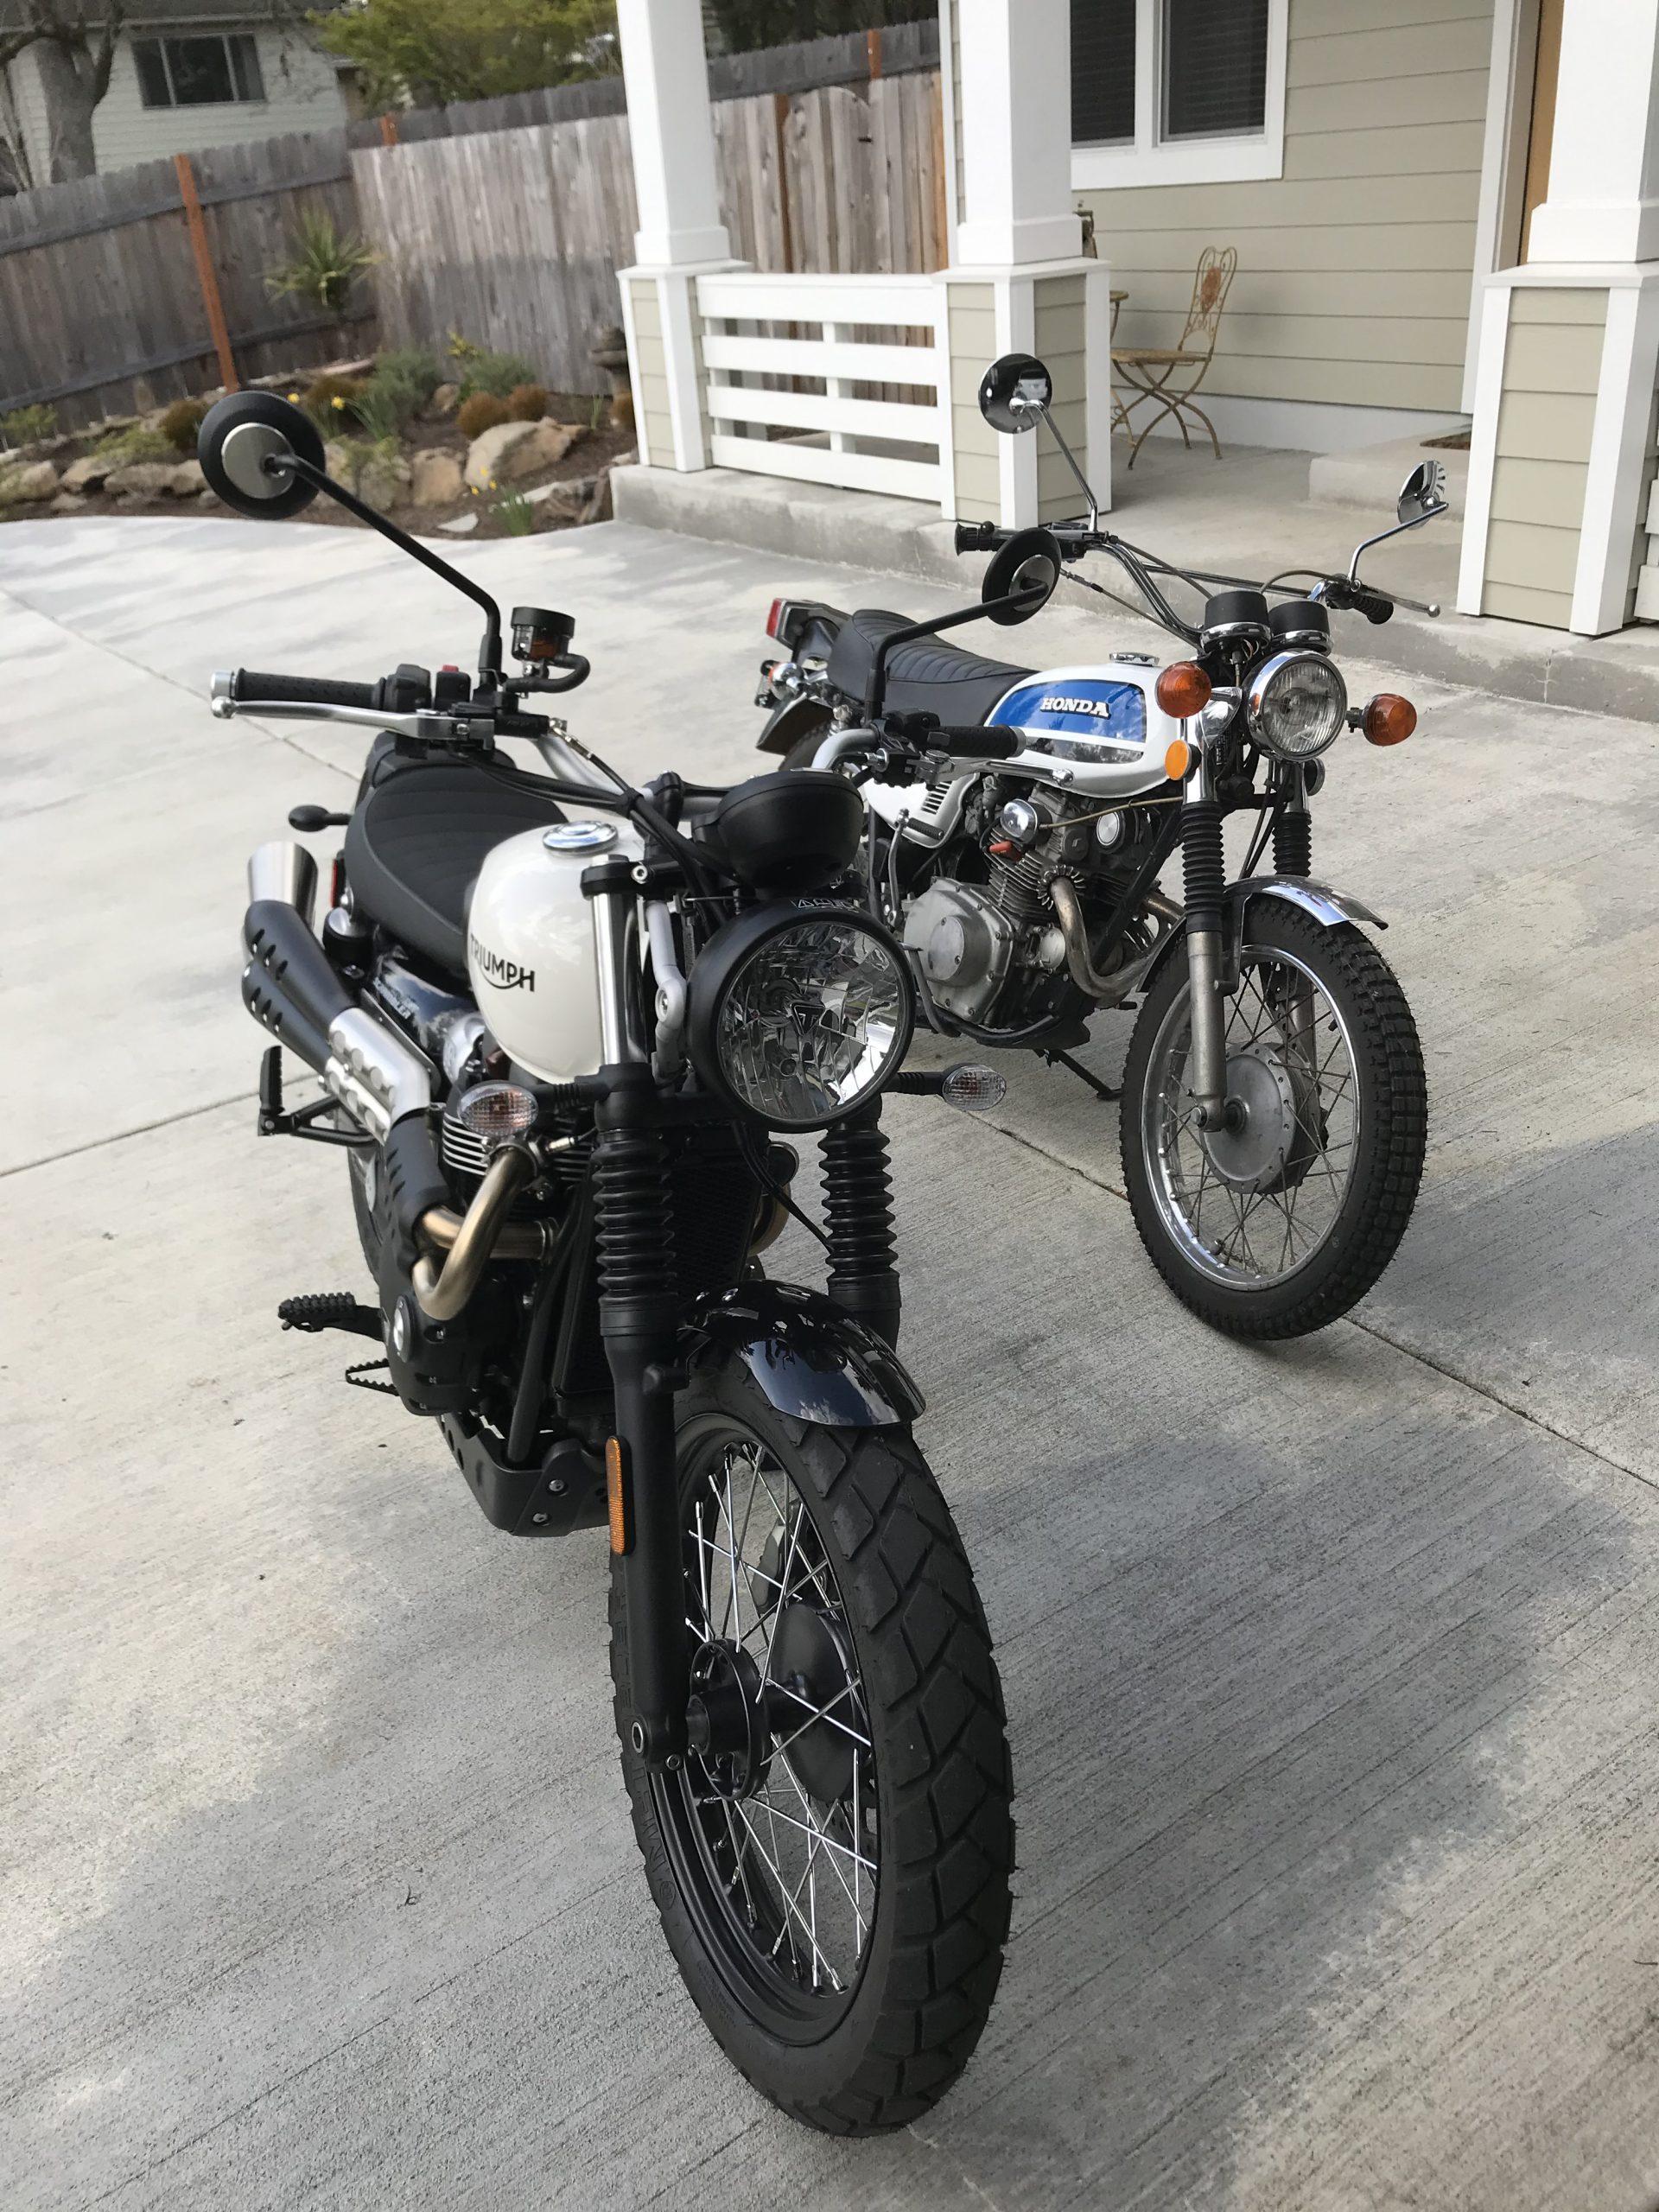 Paul Henderson's Motocycles